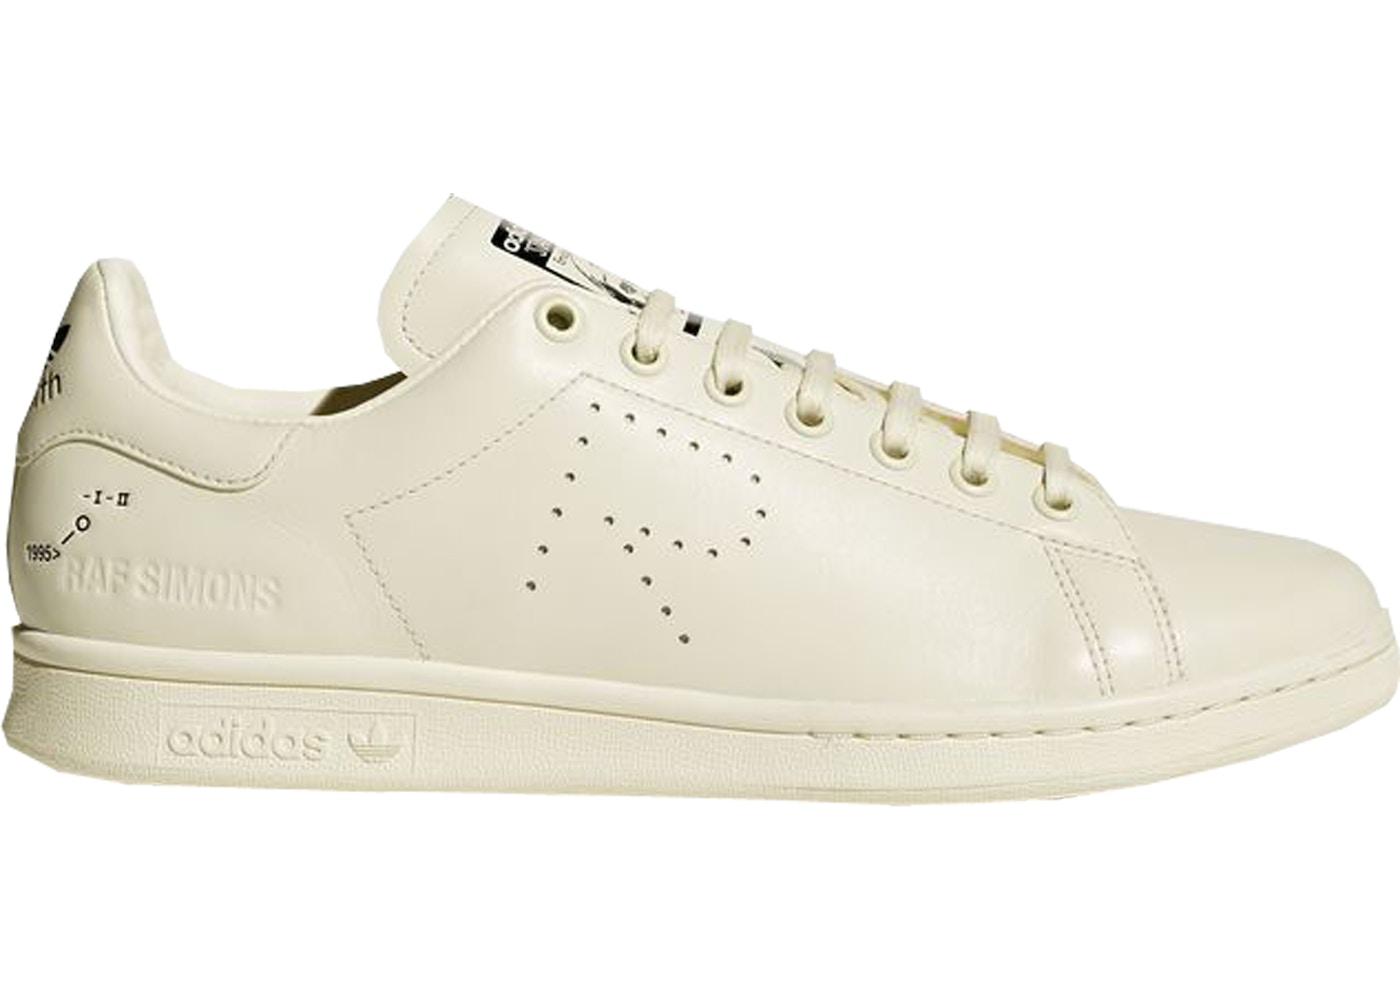 detailed look 5a5c3 d0768 adidas Stan Smith Raf Simons Cream